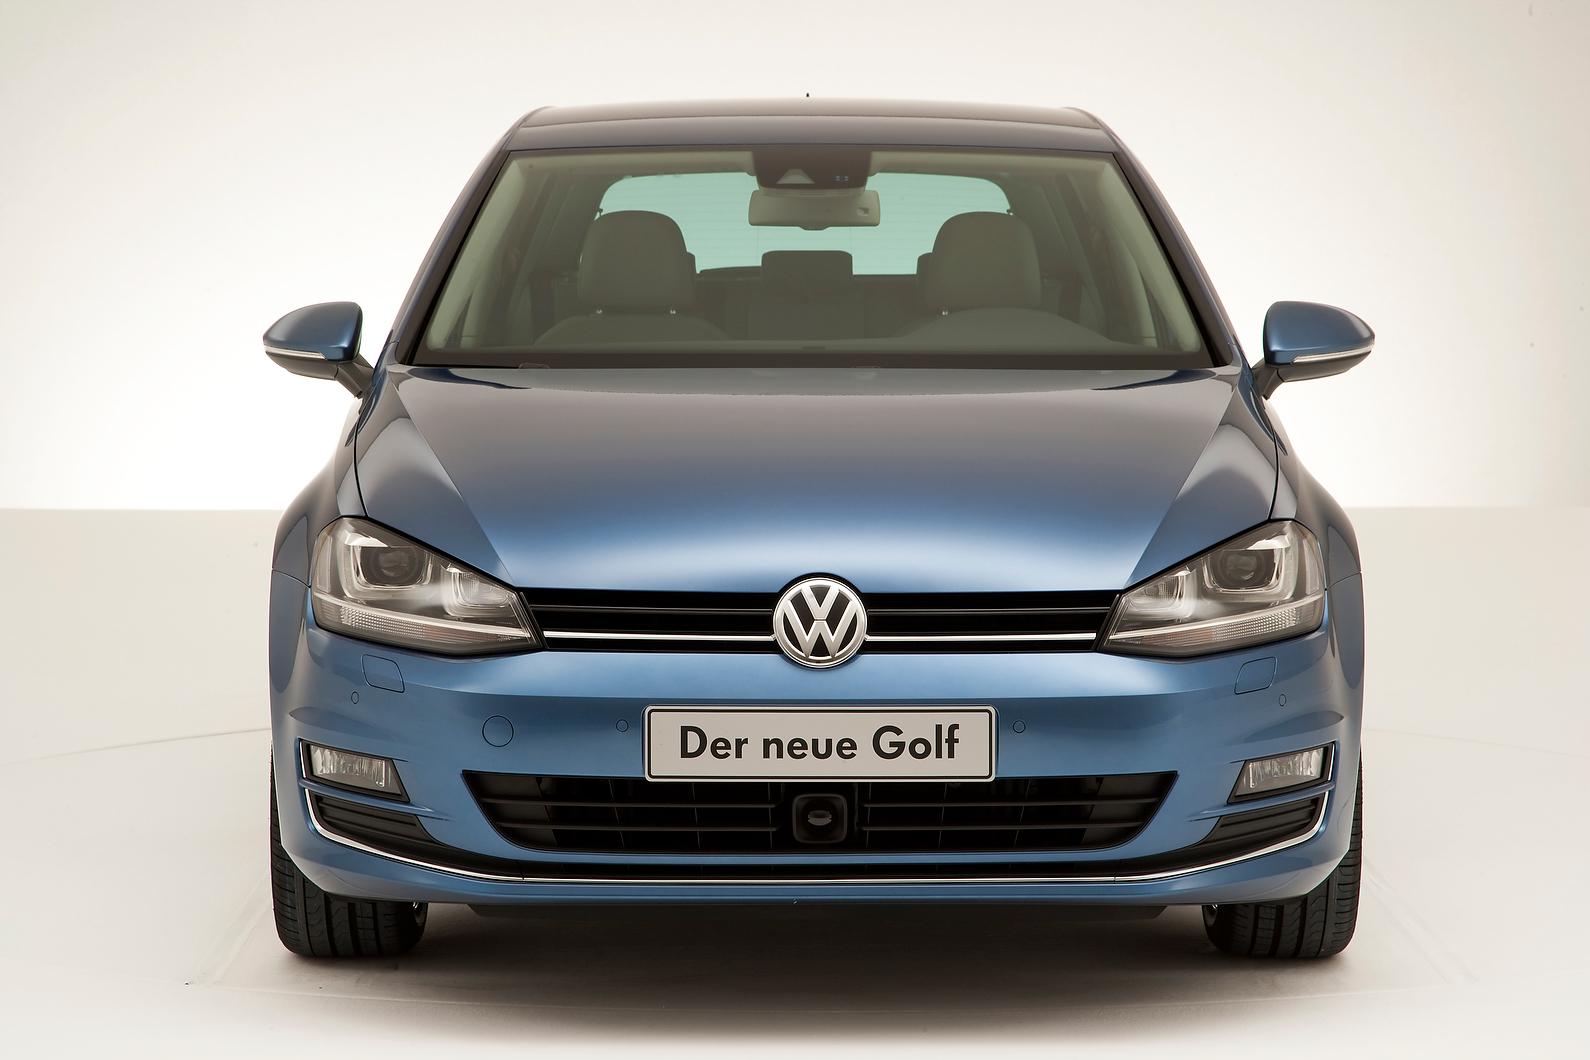 volkswagen golf on sale dates revealed exclusive gallery autocar. Black Bedroom Furniture Sets. Home Design Ideas